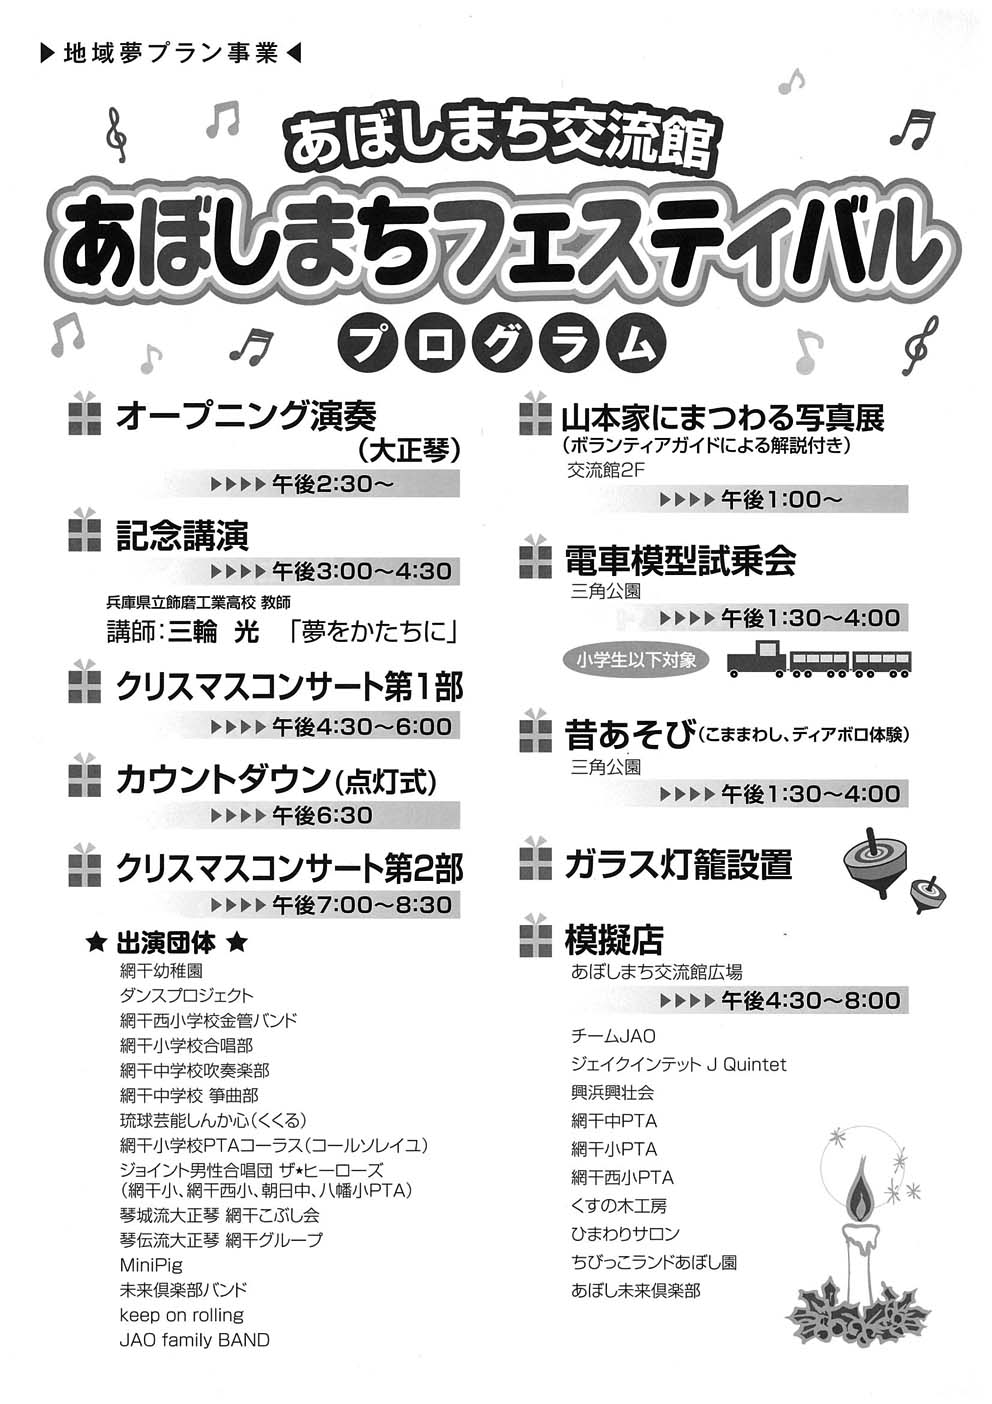 http://aboshimachi.com/akari16-b.jpg